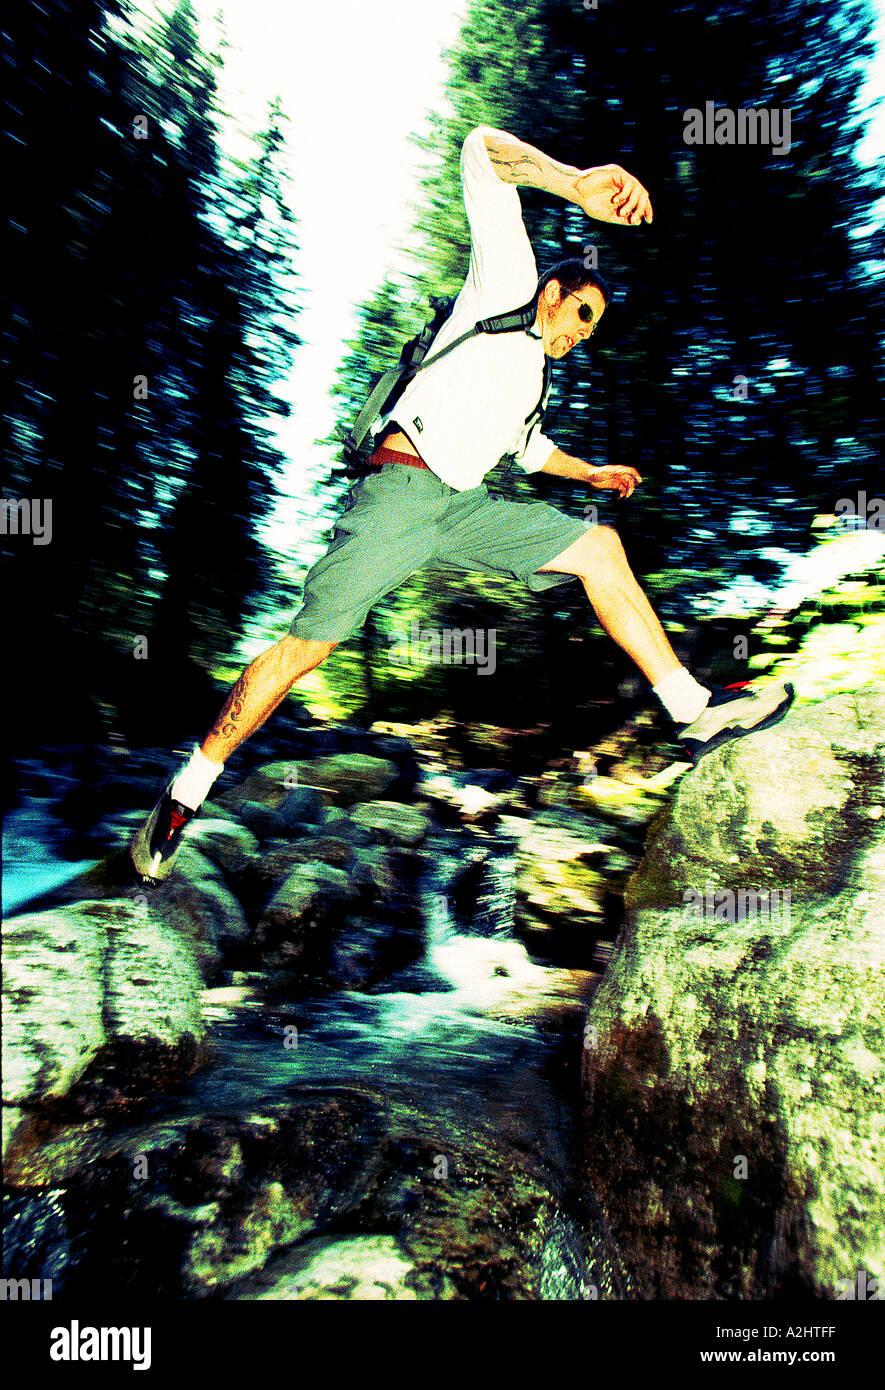 Man age 20-25 jumping a waterfall. - Stock Image